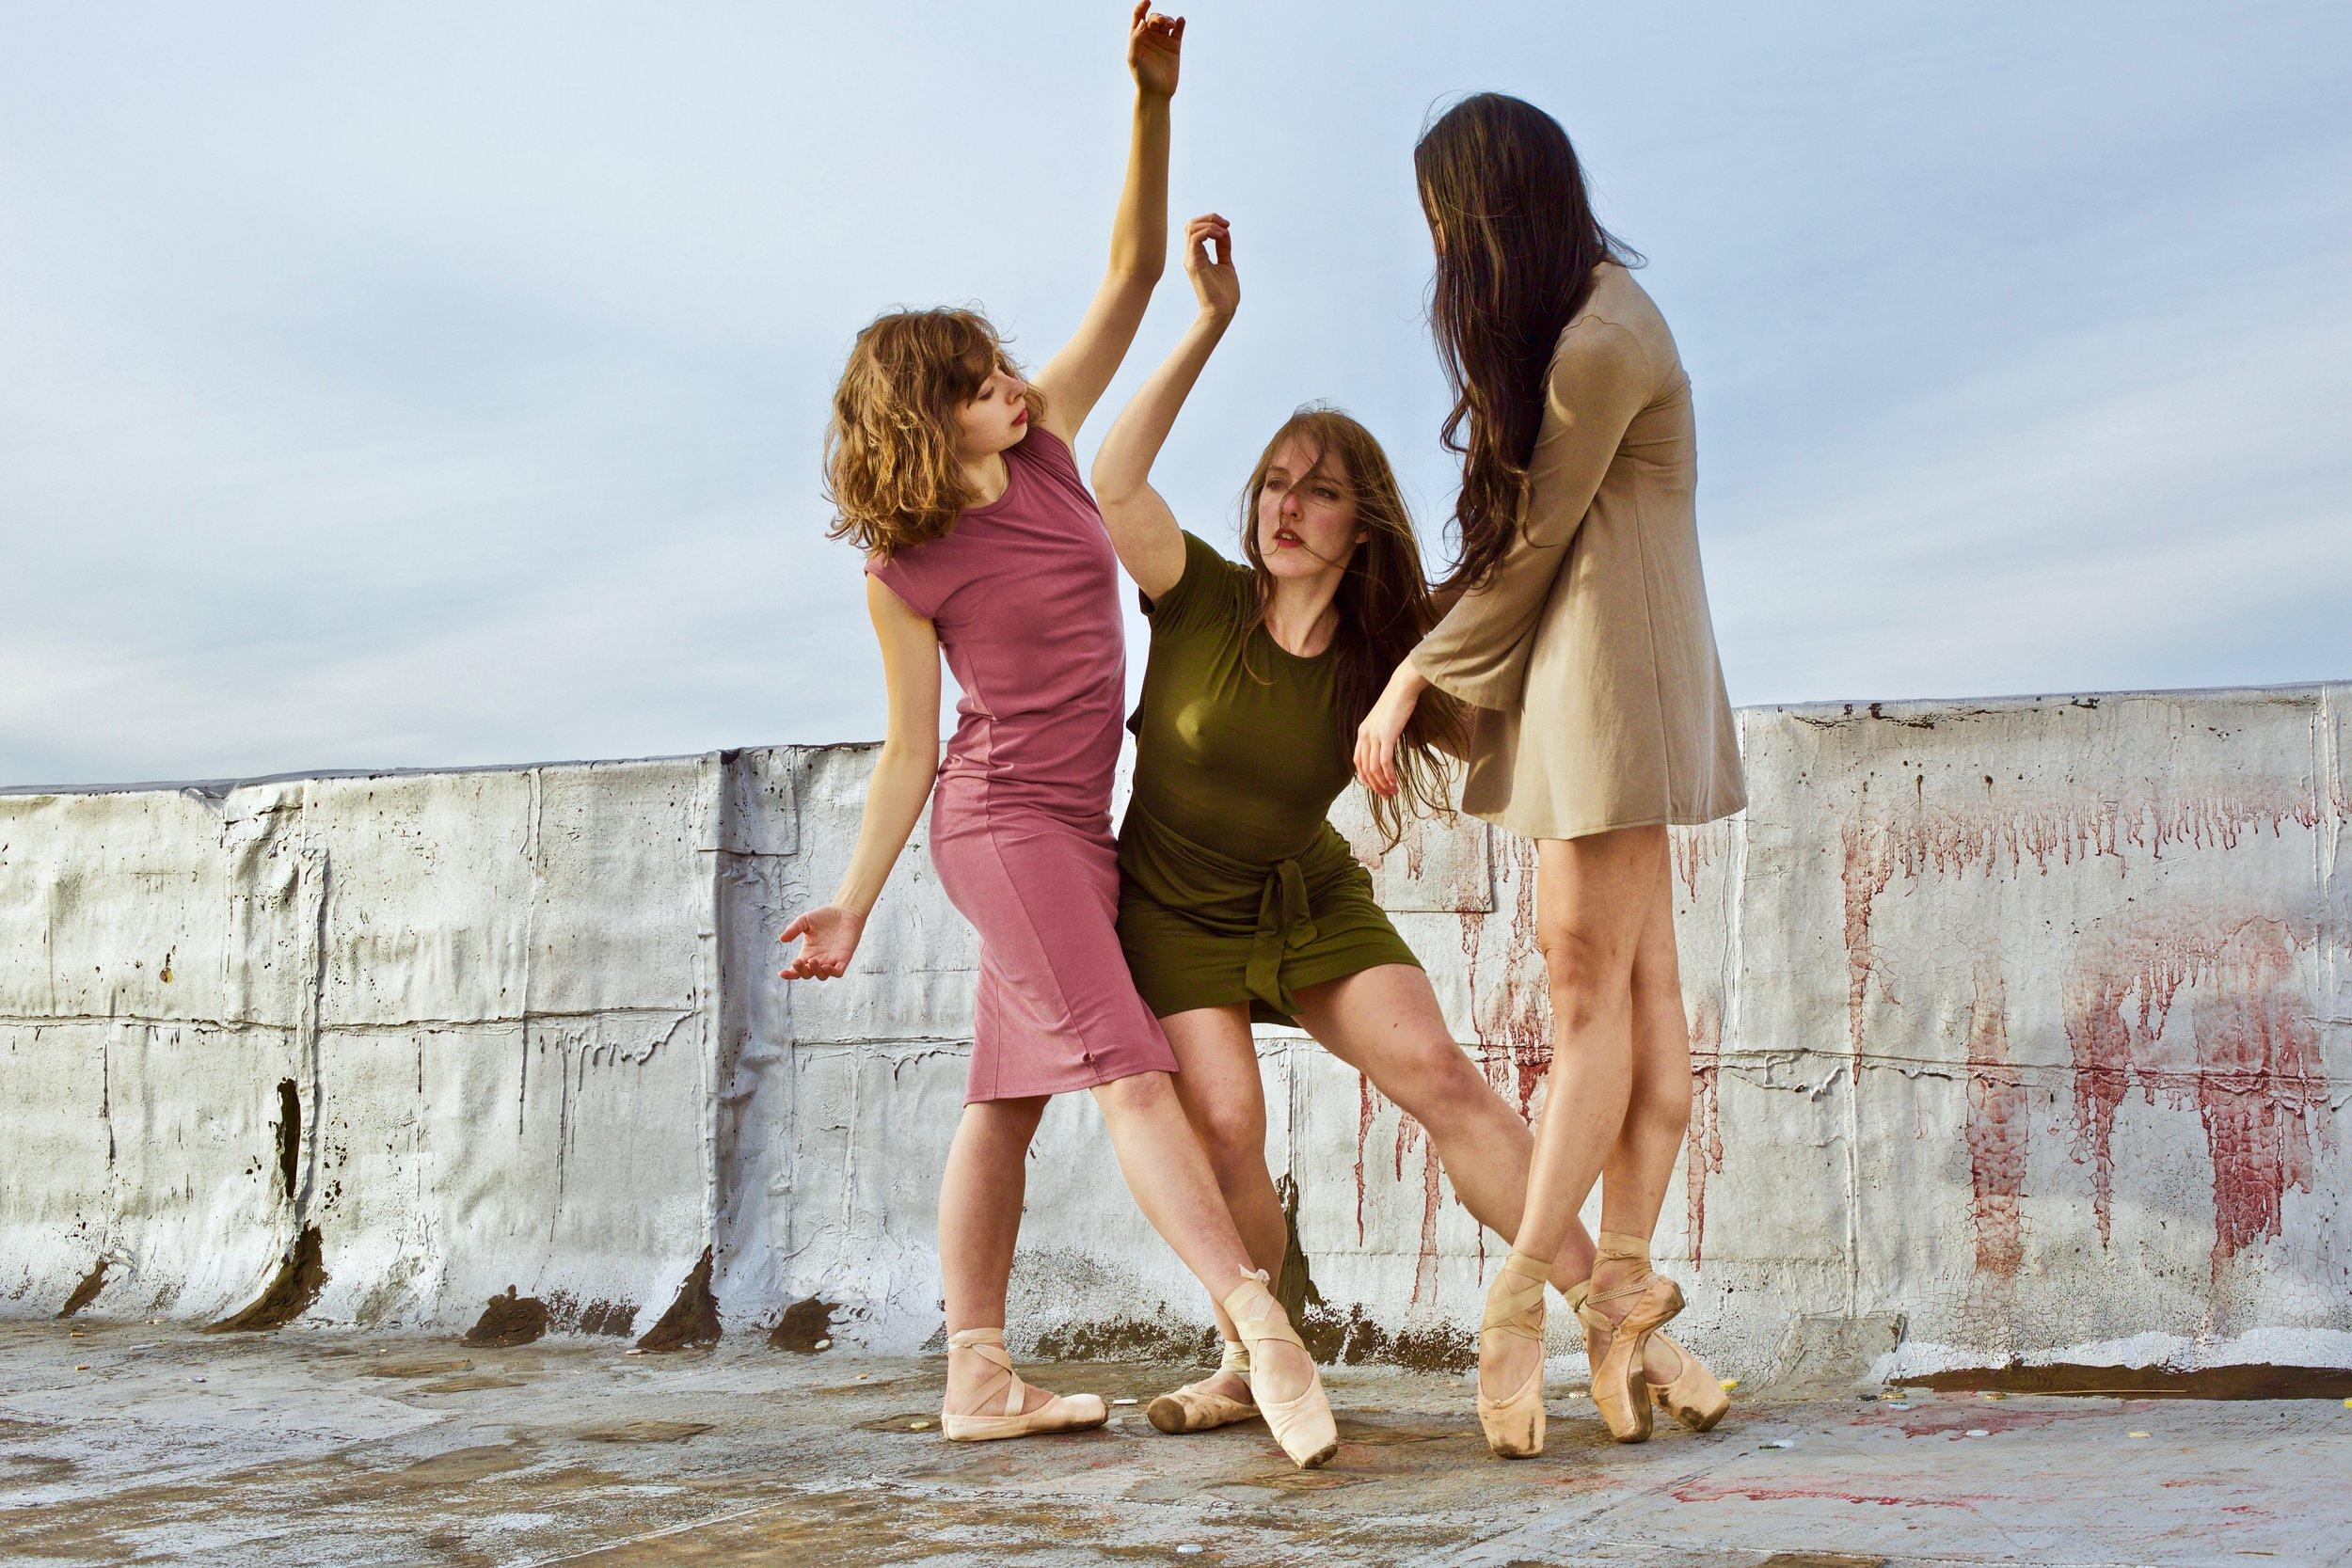 Jordan Miller, Amy Saunder, Tiffany Mangulabnan